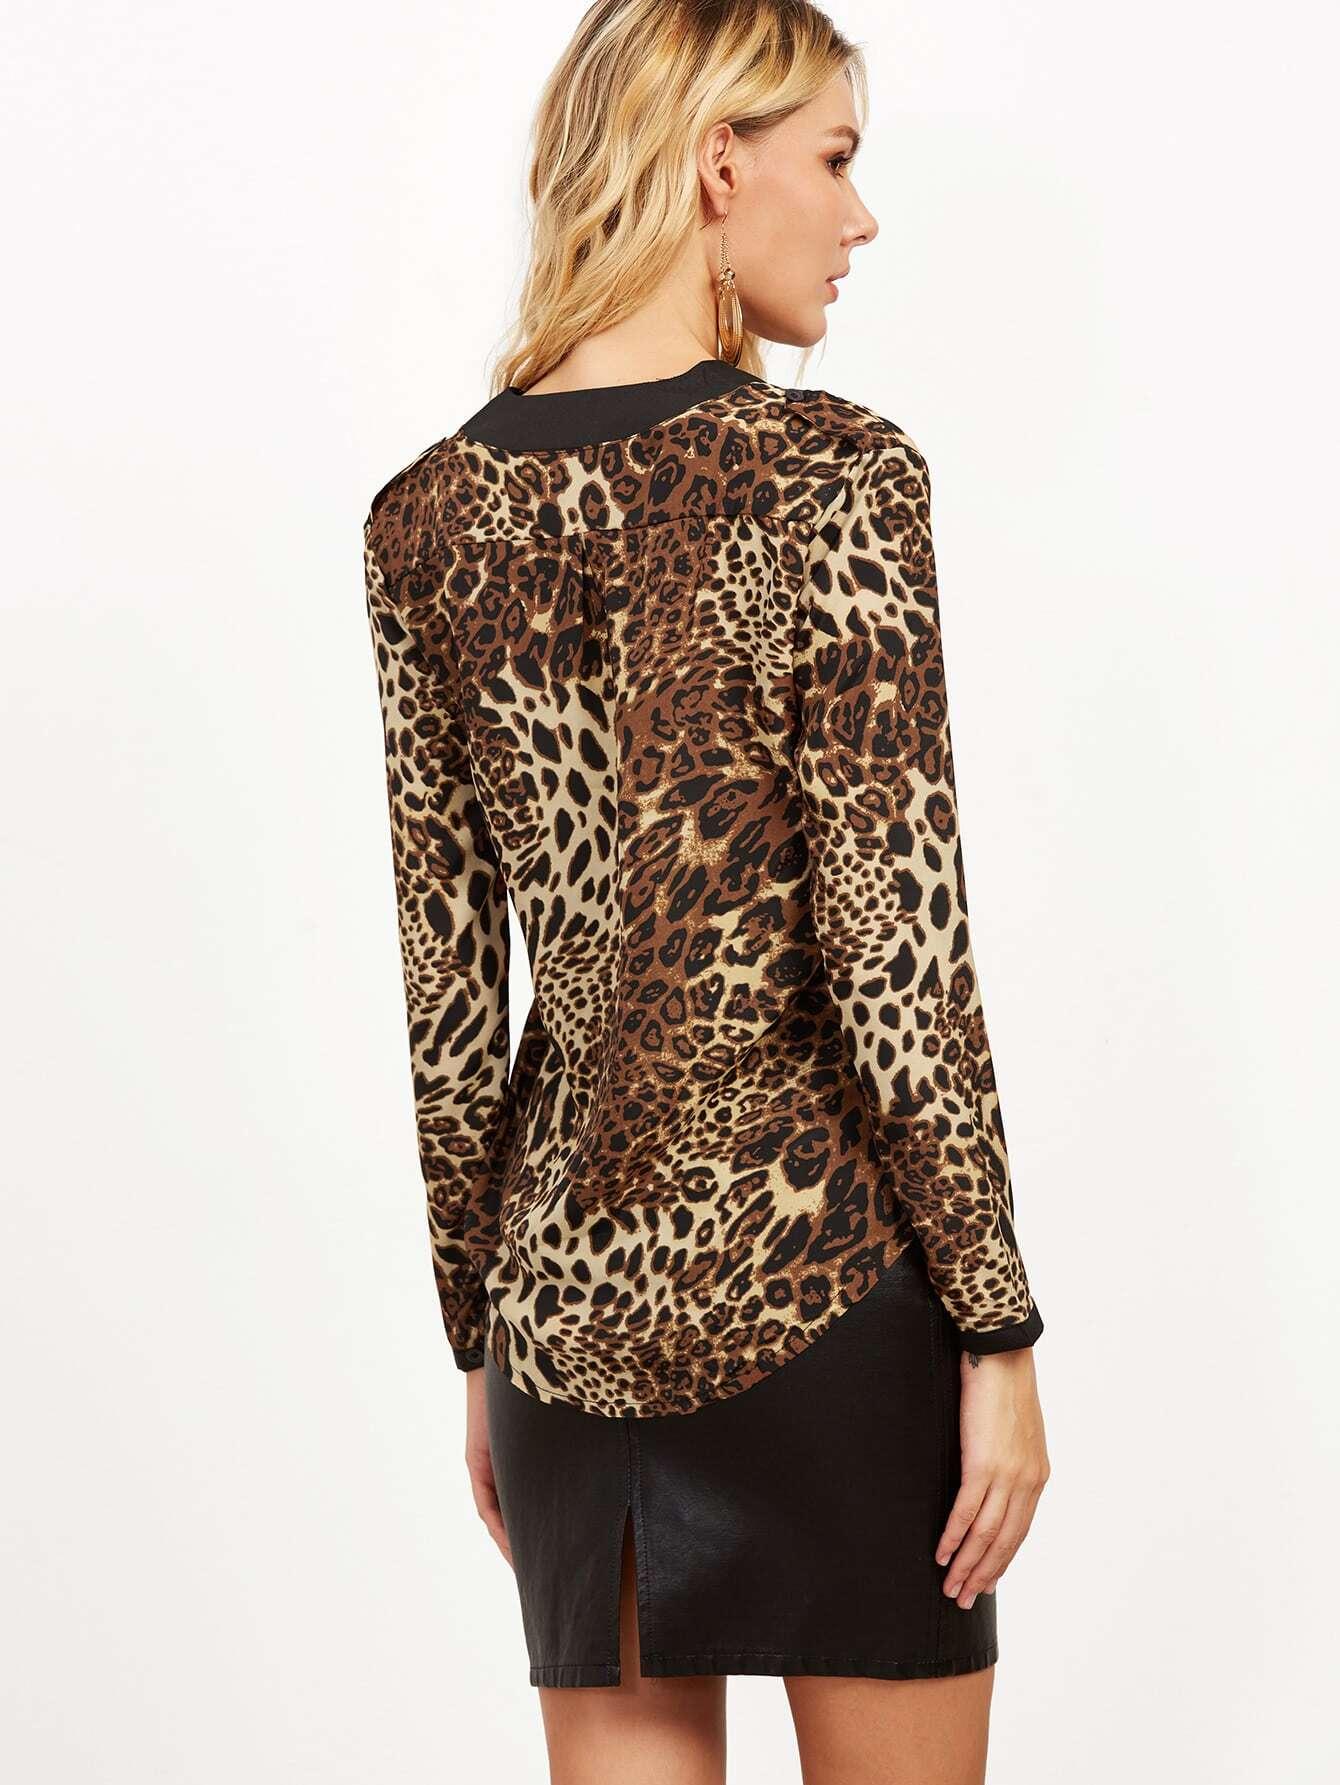 blouse160921102_2